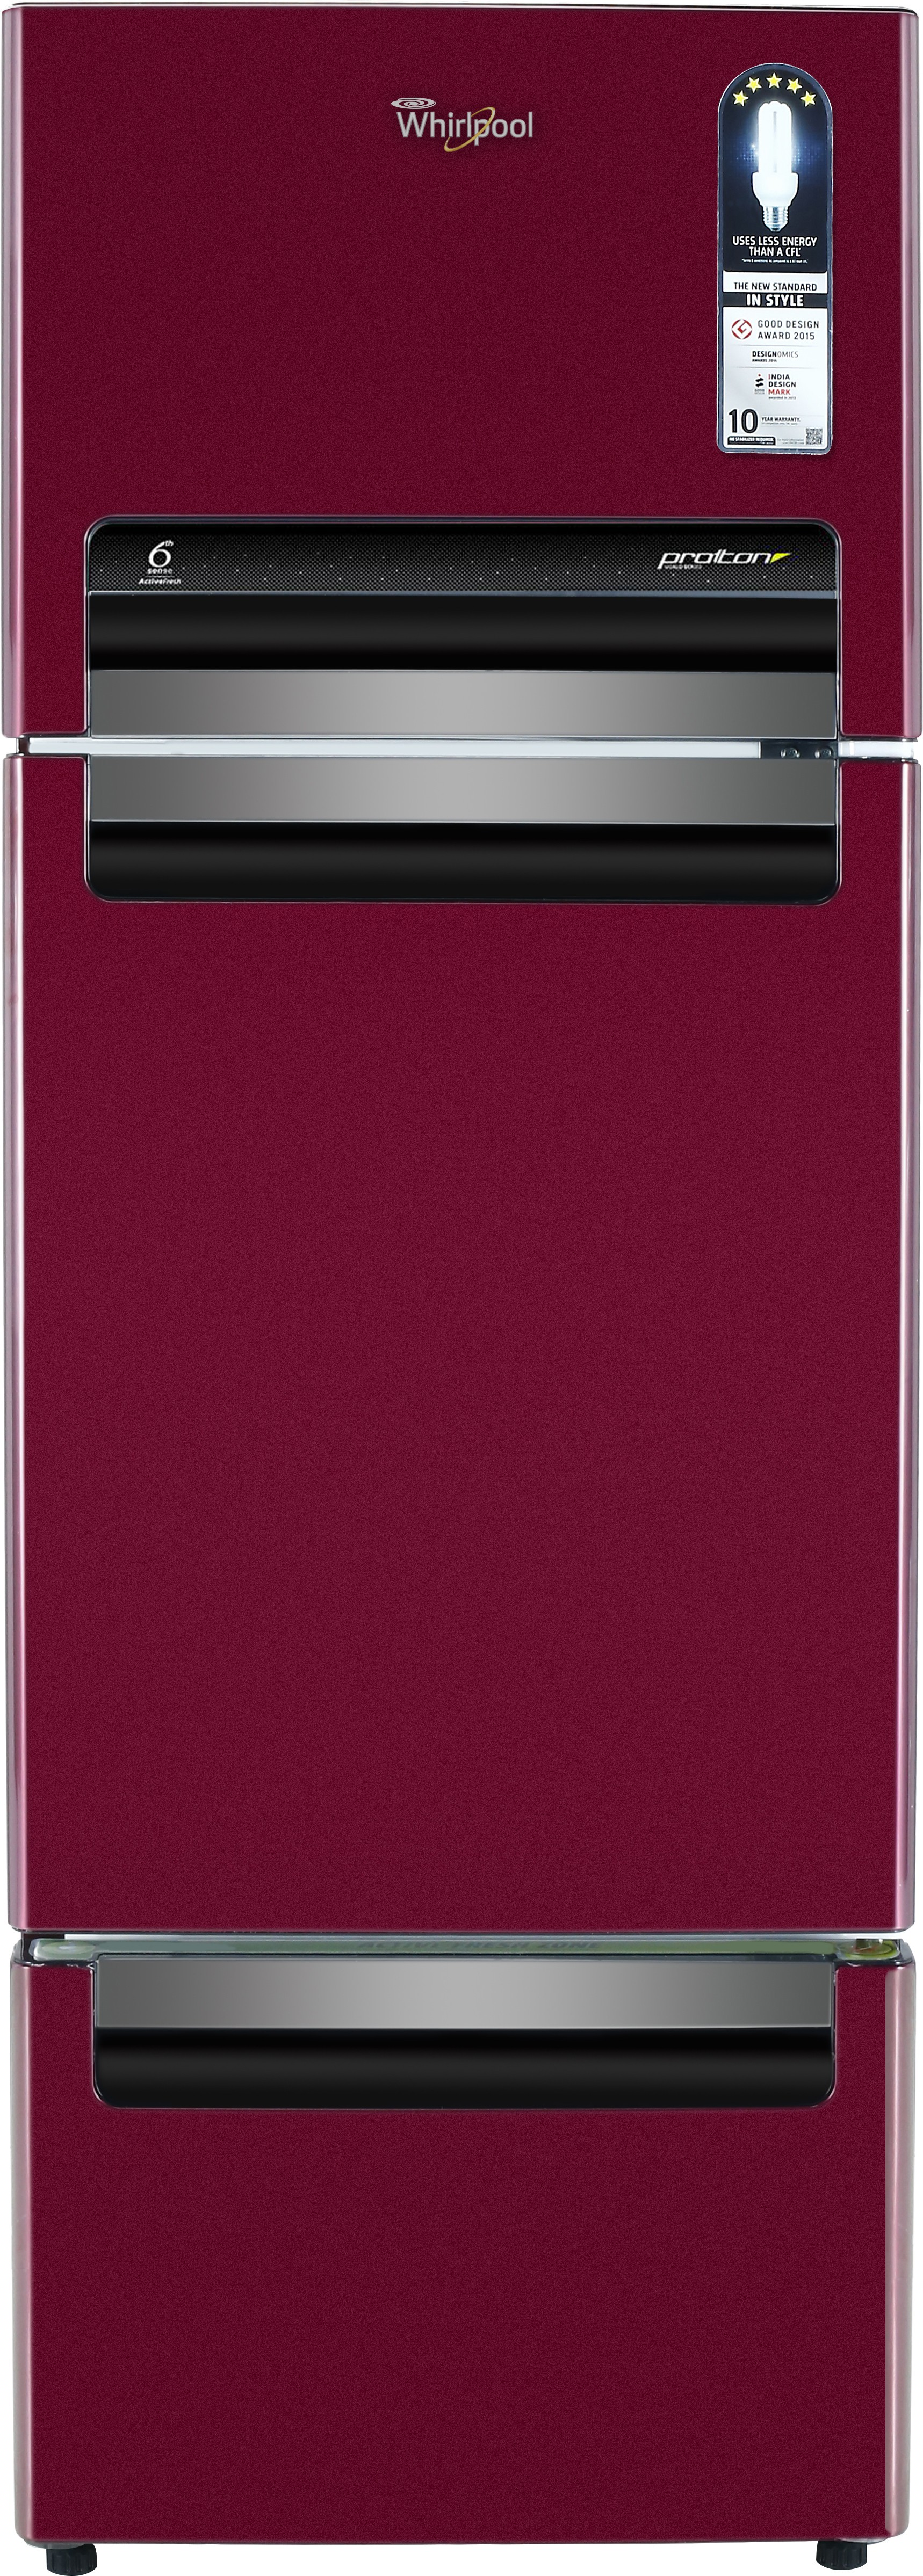 Whirlpool 240 L Frost Free Triple Door Refrigerator(FP 263D PROTTON ROY, Wine Alpha, 2017)